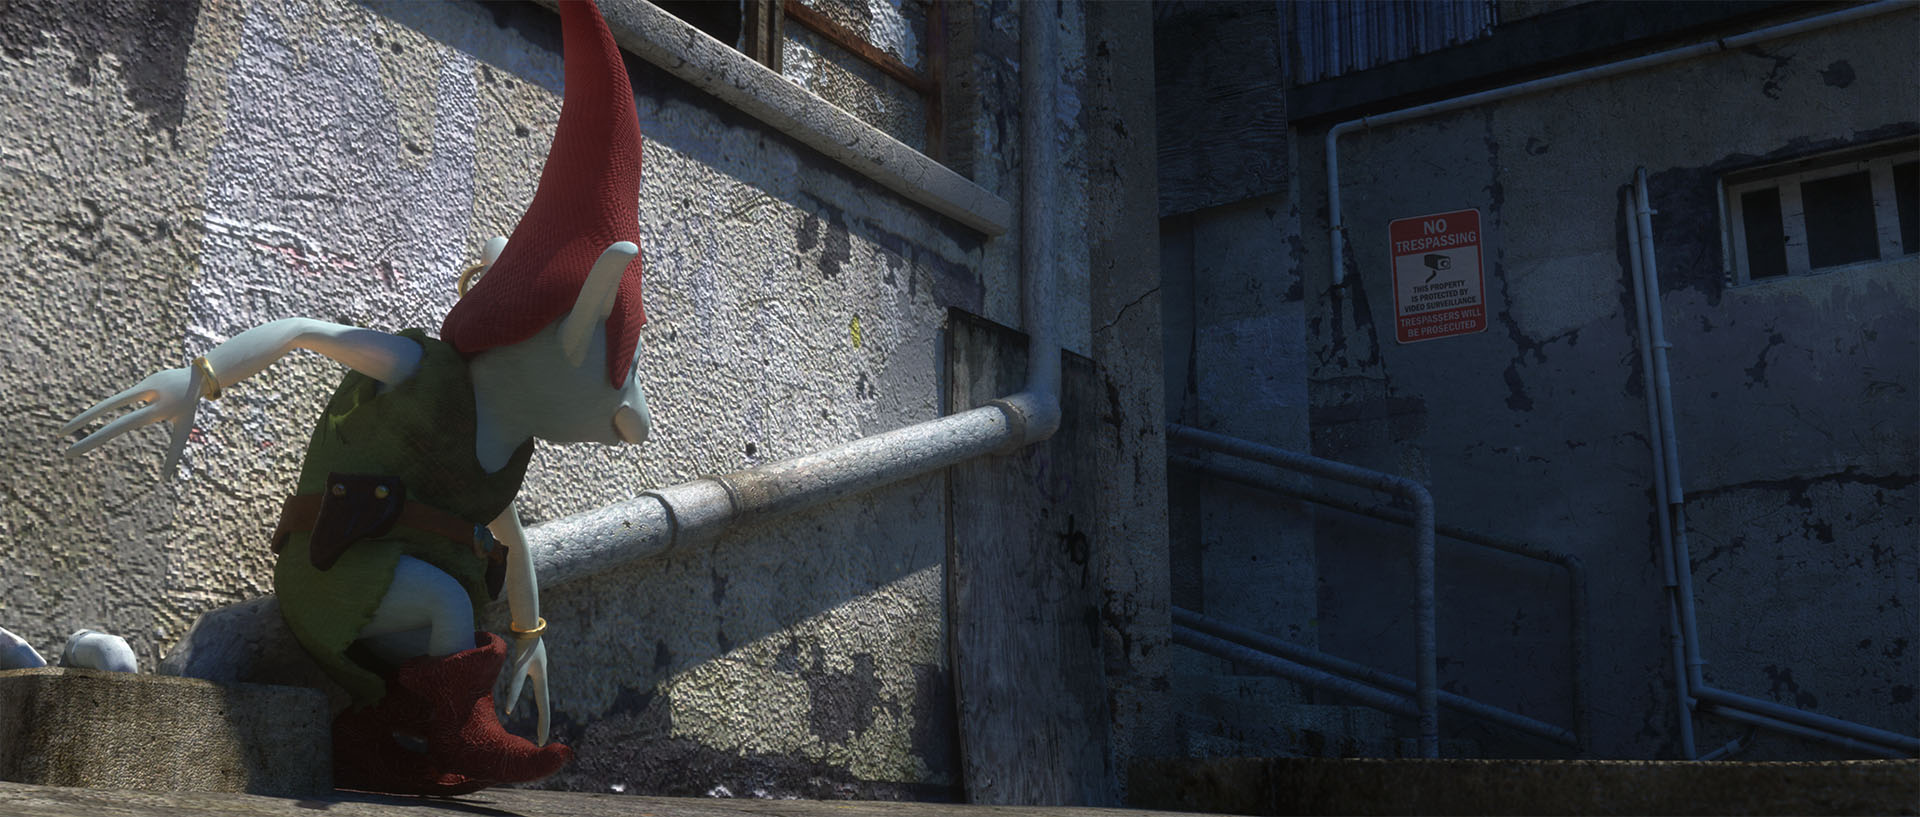 181128 Gnome Sneak1.jpg